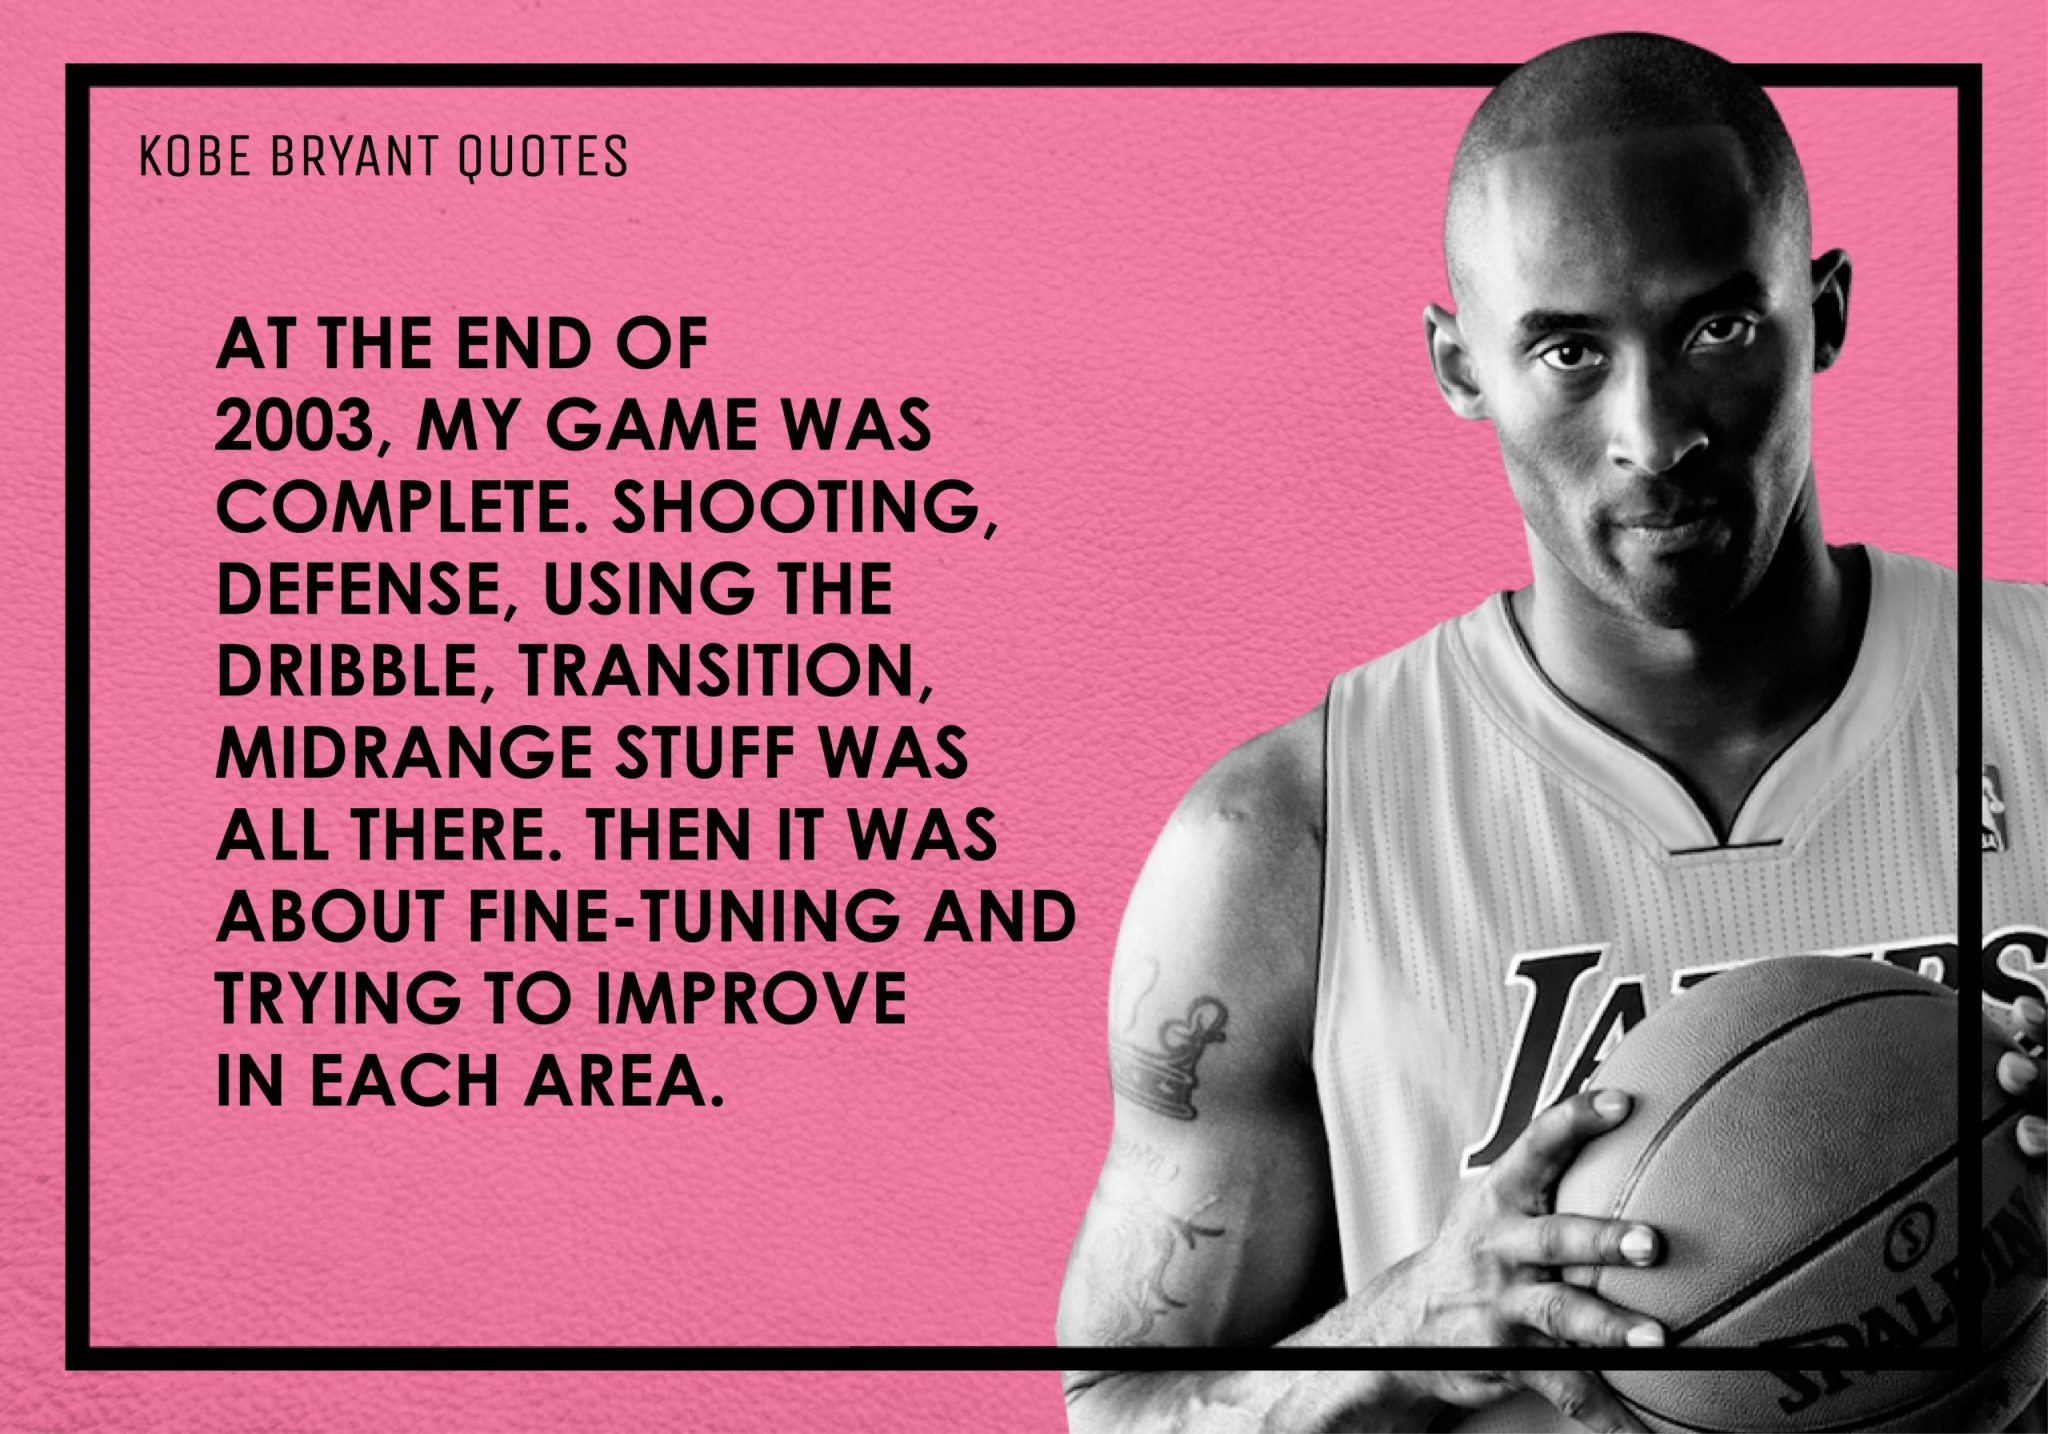 Kobe Bryant Quotes (15)